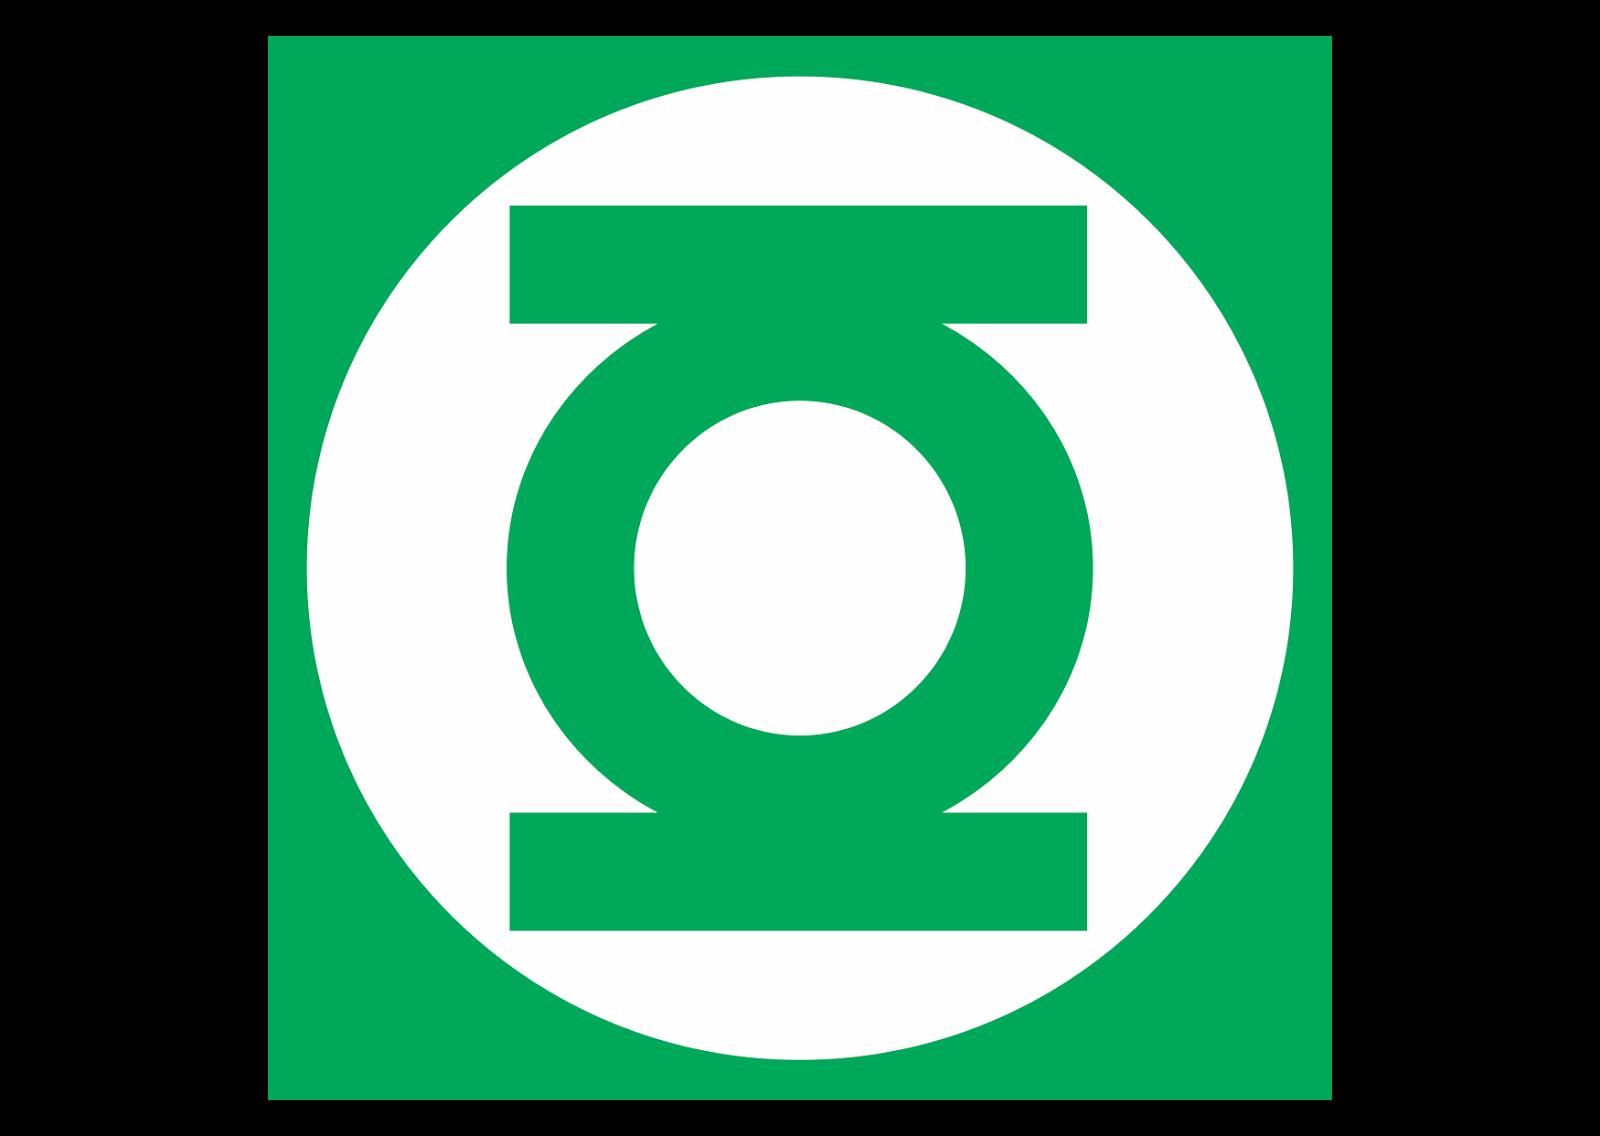 Green Lantern Corps Logo Vector ~ Format Cdr, Ai, Eps, Svg ...